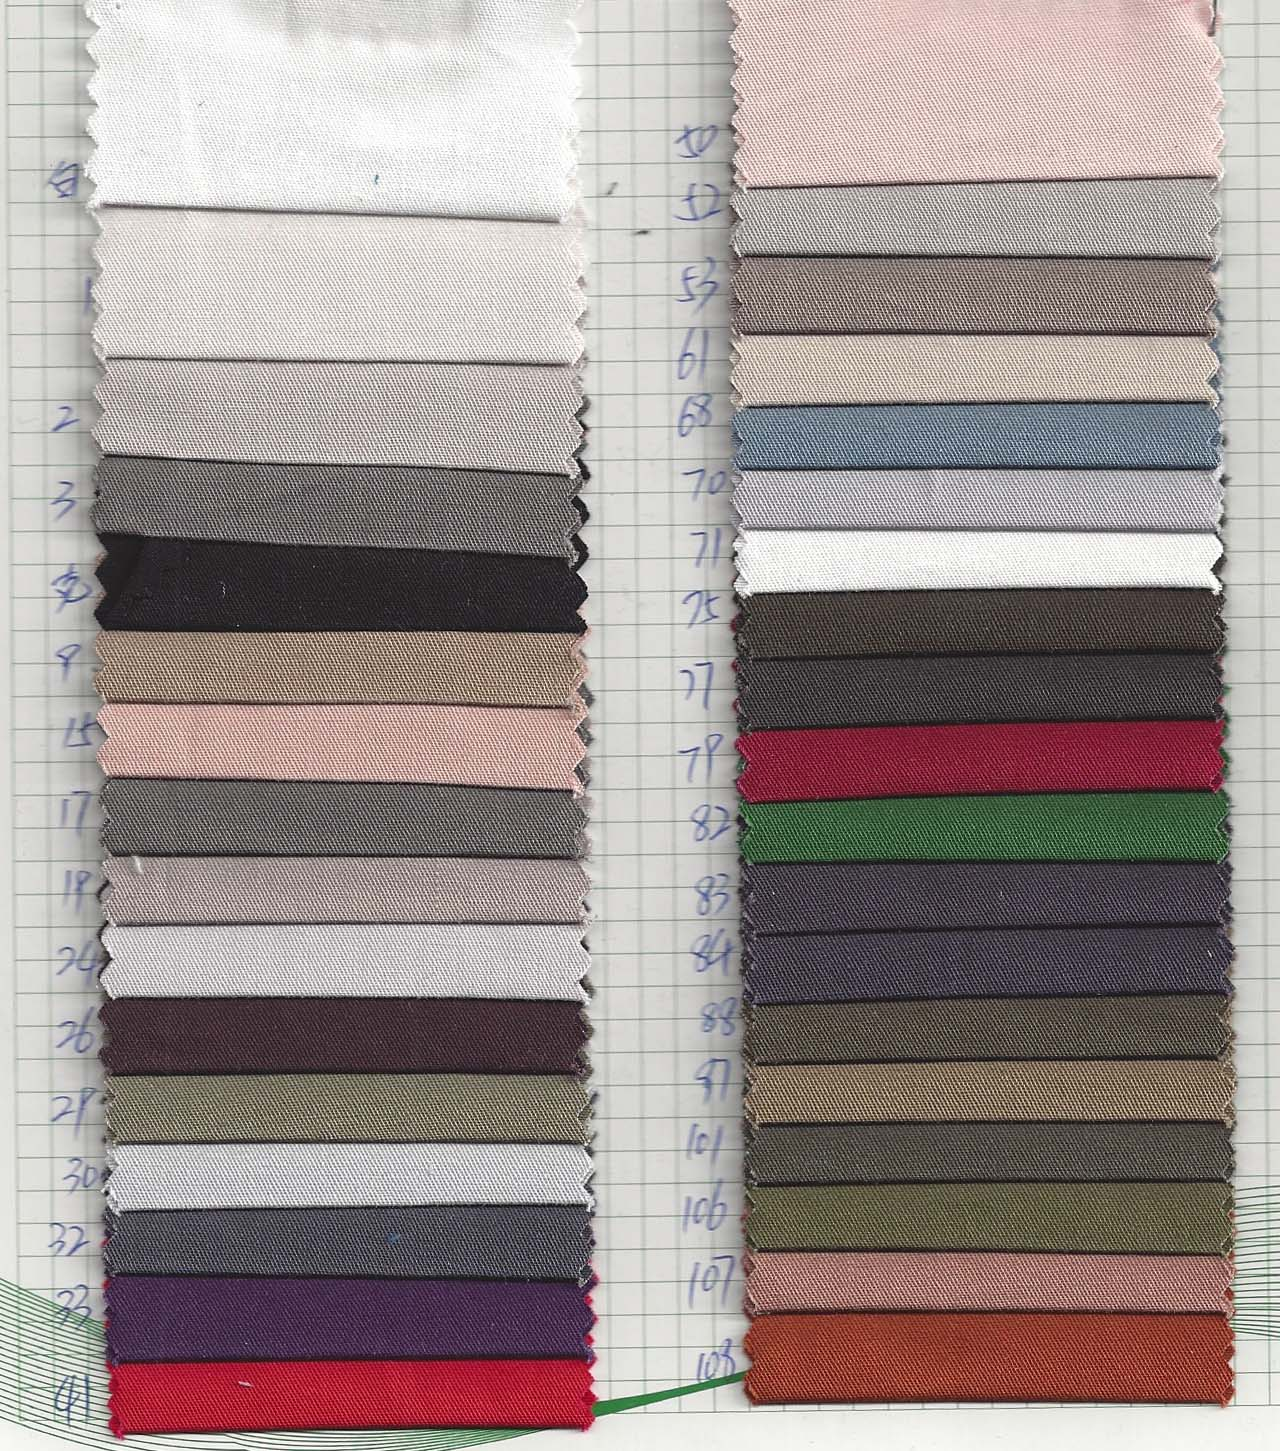 Textile Da Yuan C1336.jpg